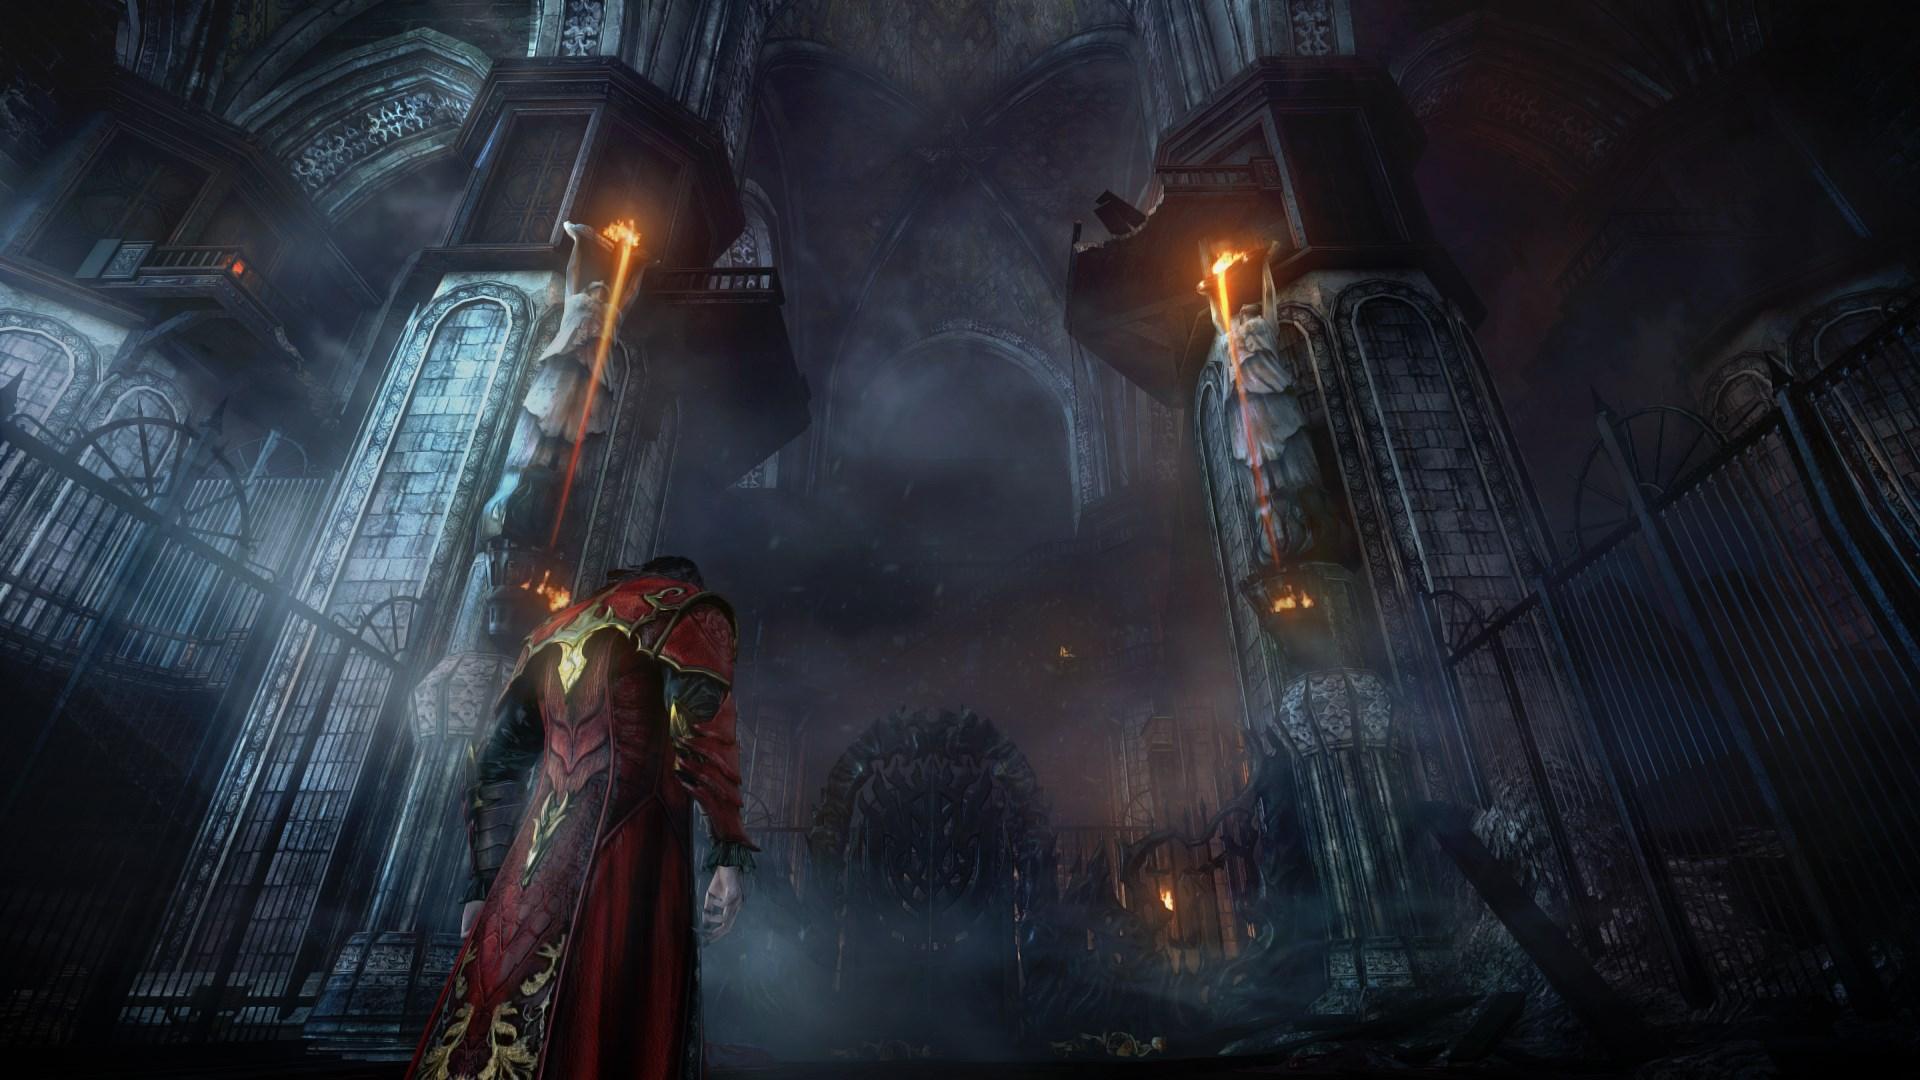 Screenshoty z Castlevania: Lords of Shadow 2 83327